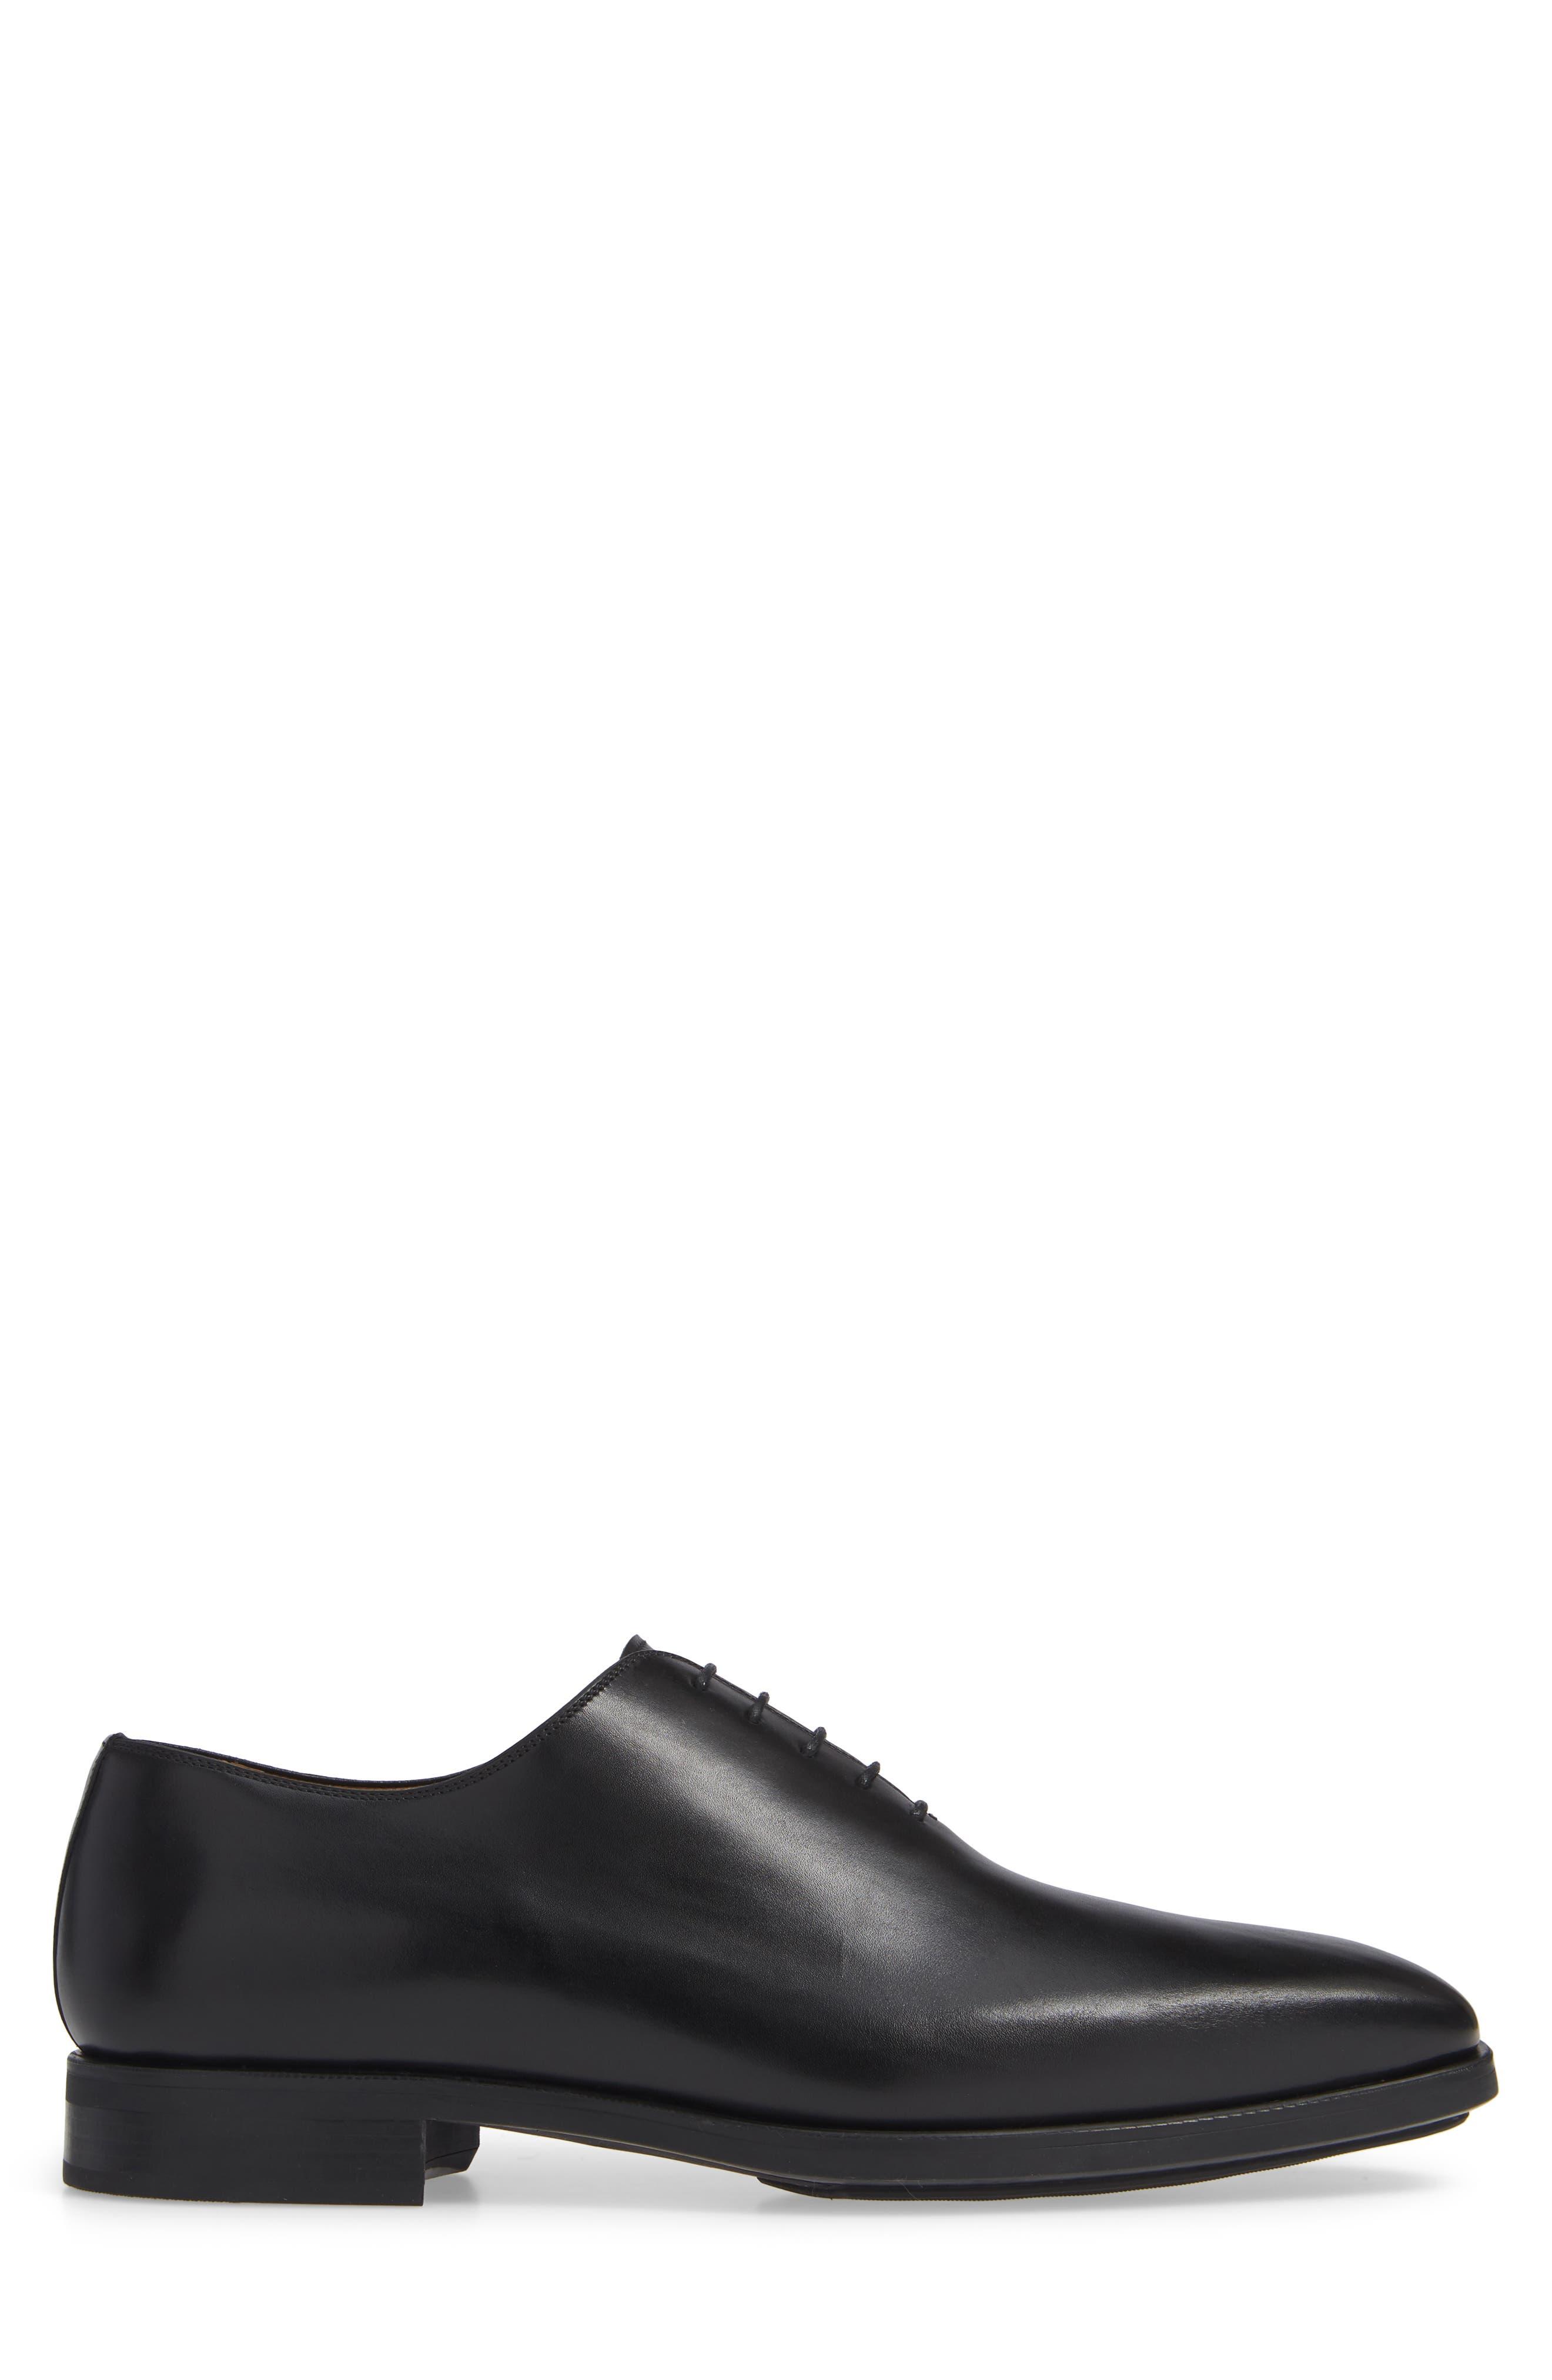 Ryder Plain Toe Oxford,                             Alternate thumbnail 3, color,                             BLACK LEATHER